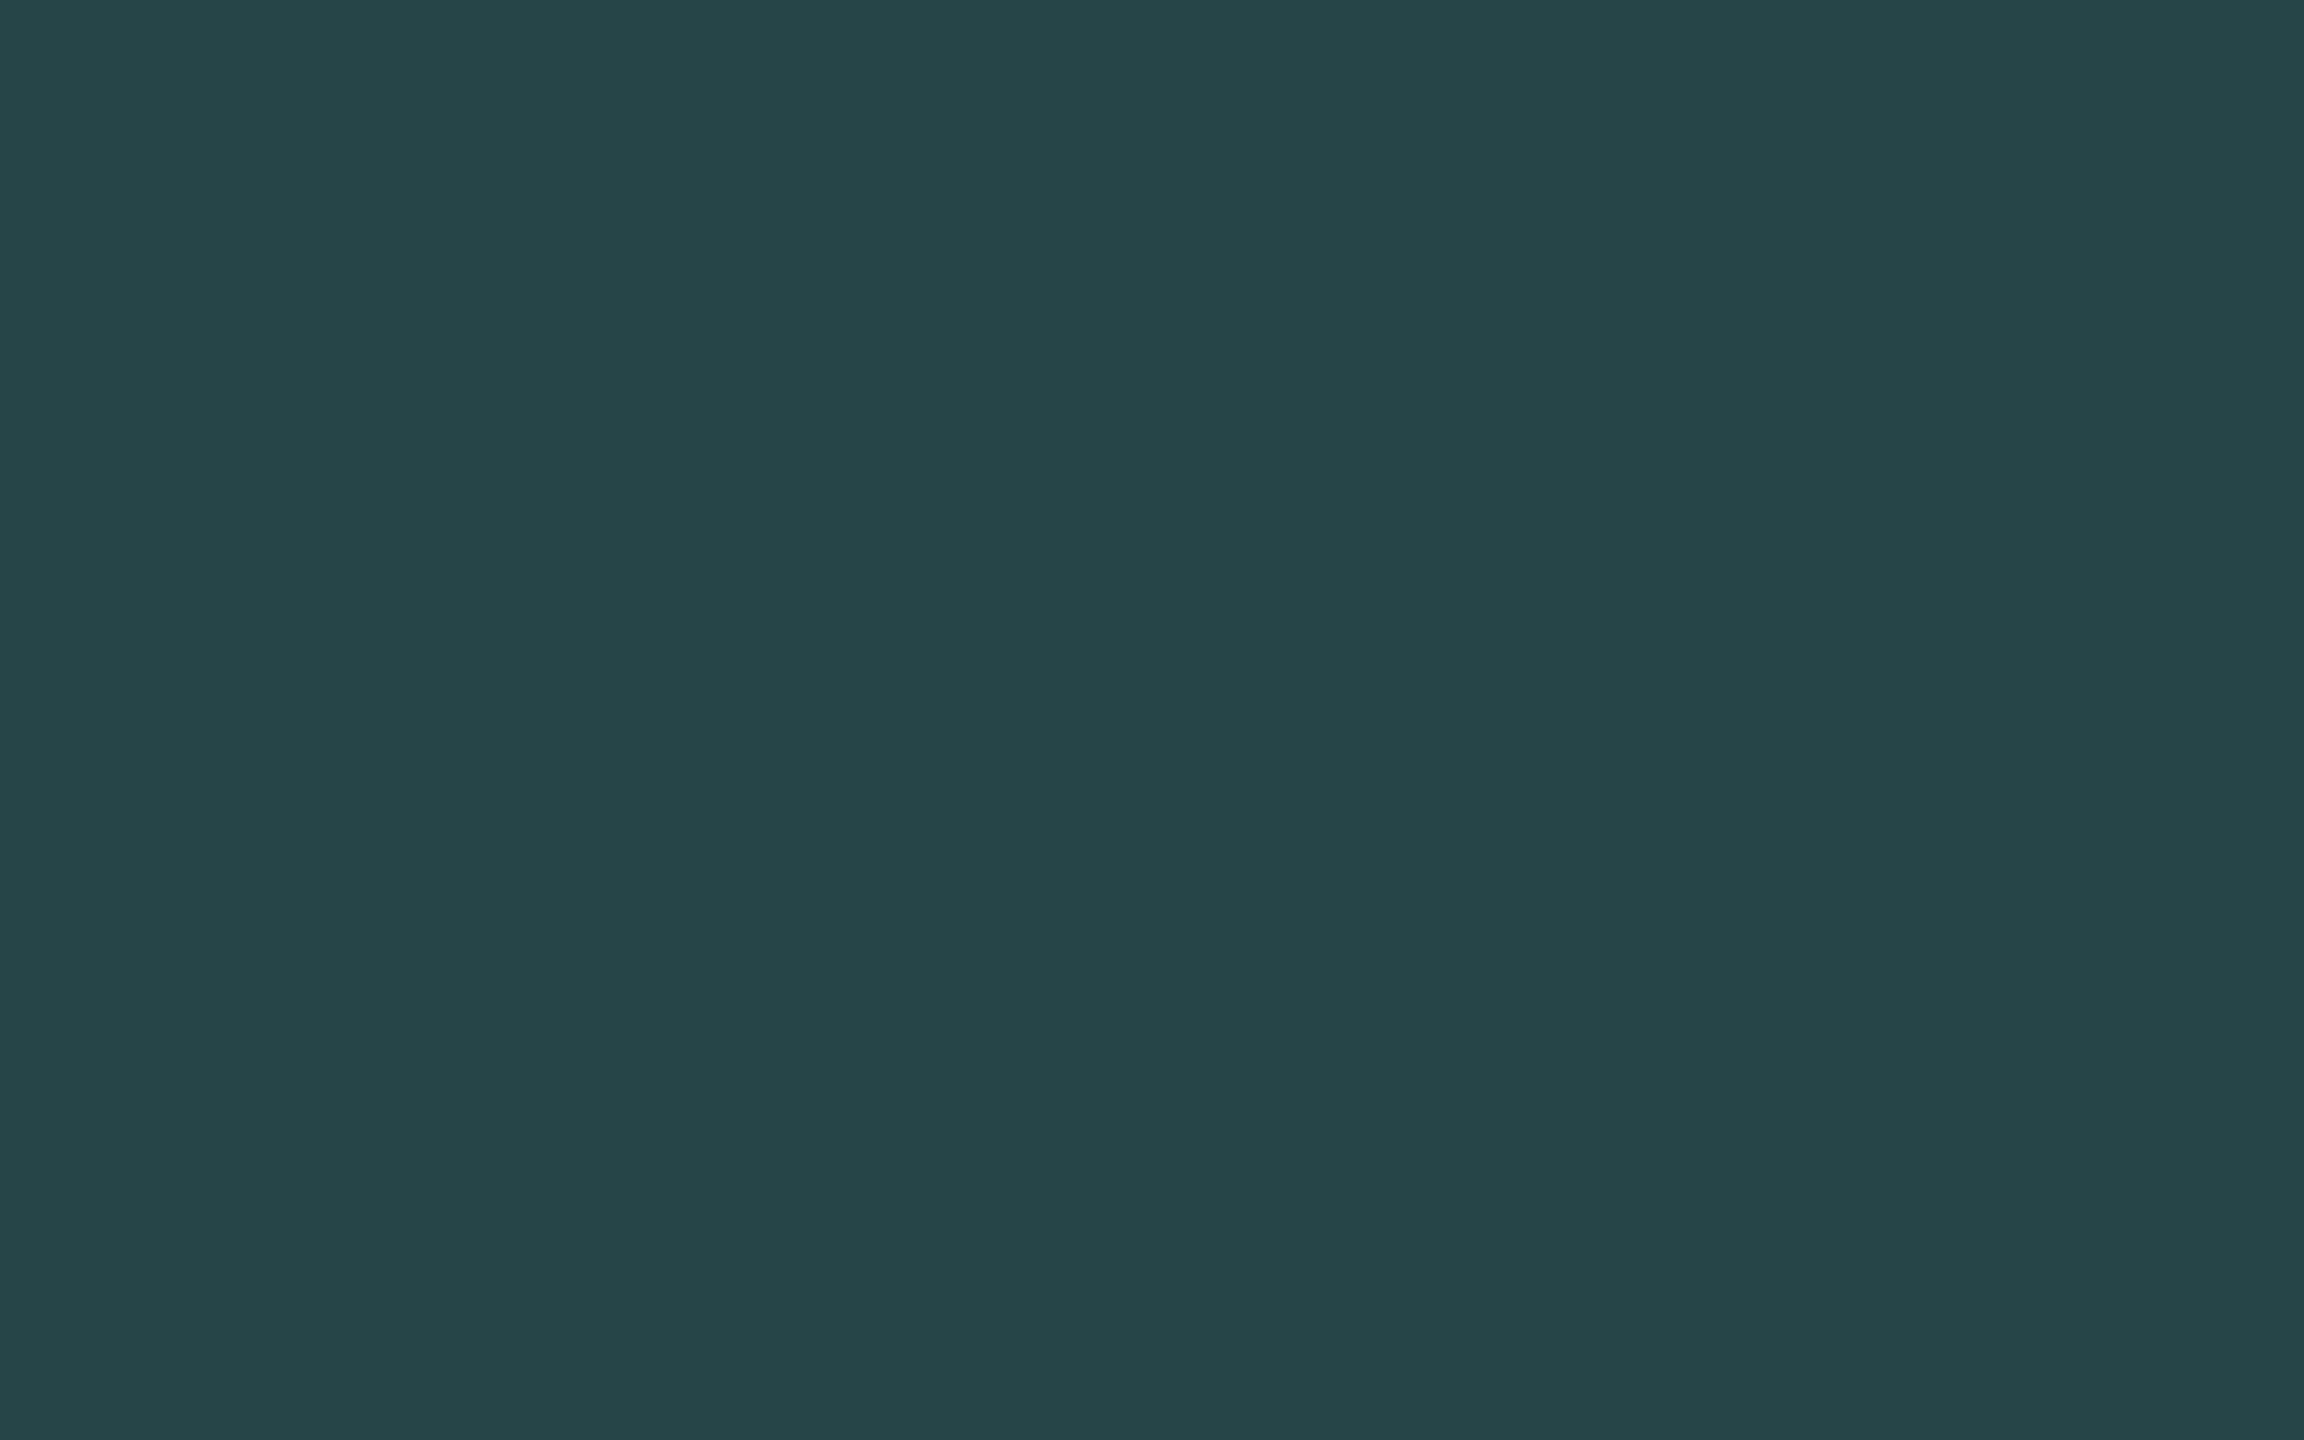 2304x1440 Japanese Indigo Solid Color Background